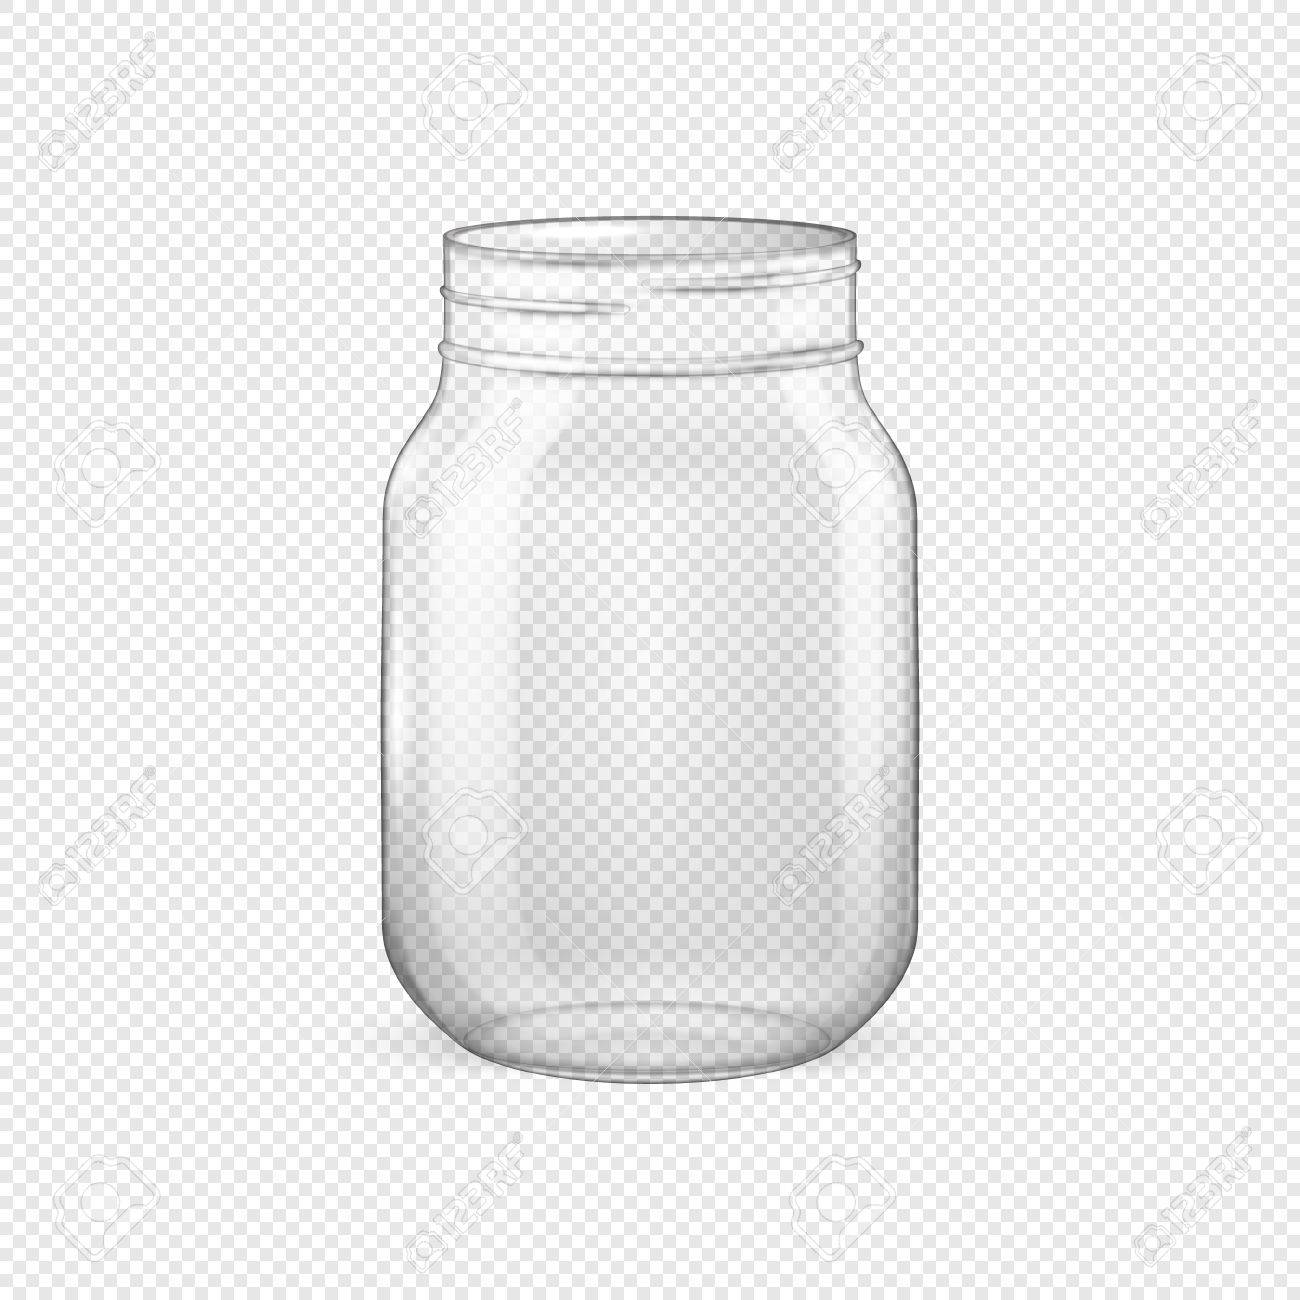 Mason Jar Transparent Background & Free Mason Jar.